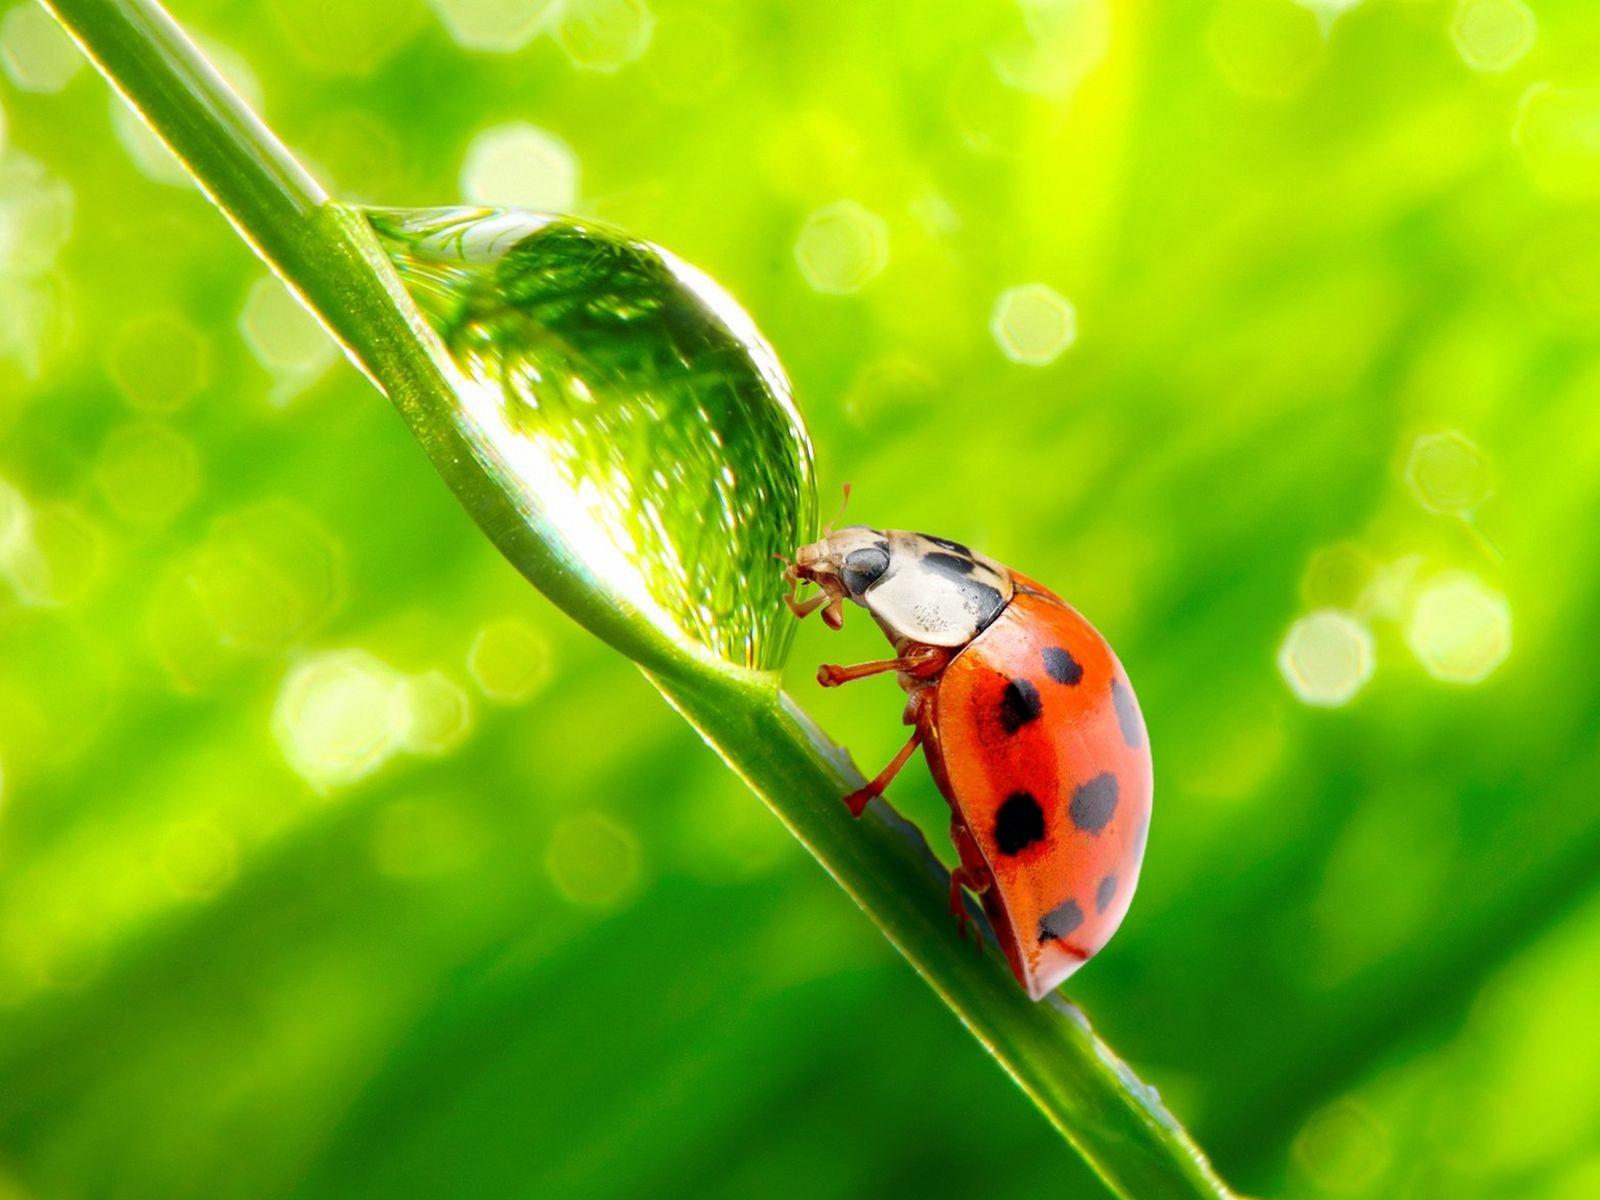 ladybug on leaf green blurred lights hd wallpaper   hd nature wallpapers